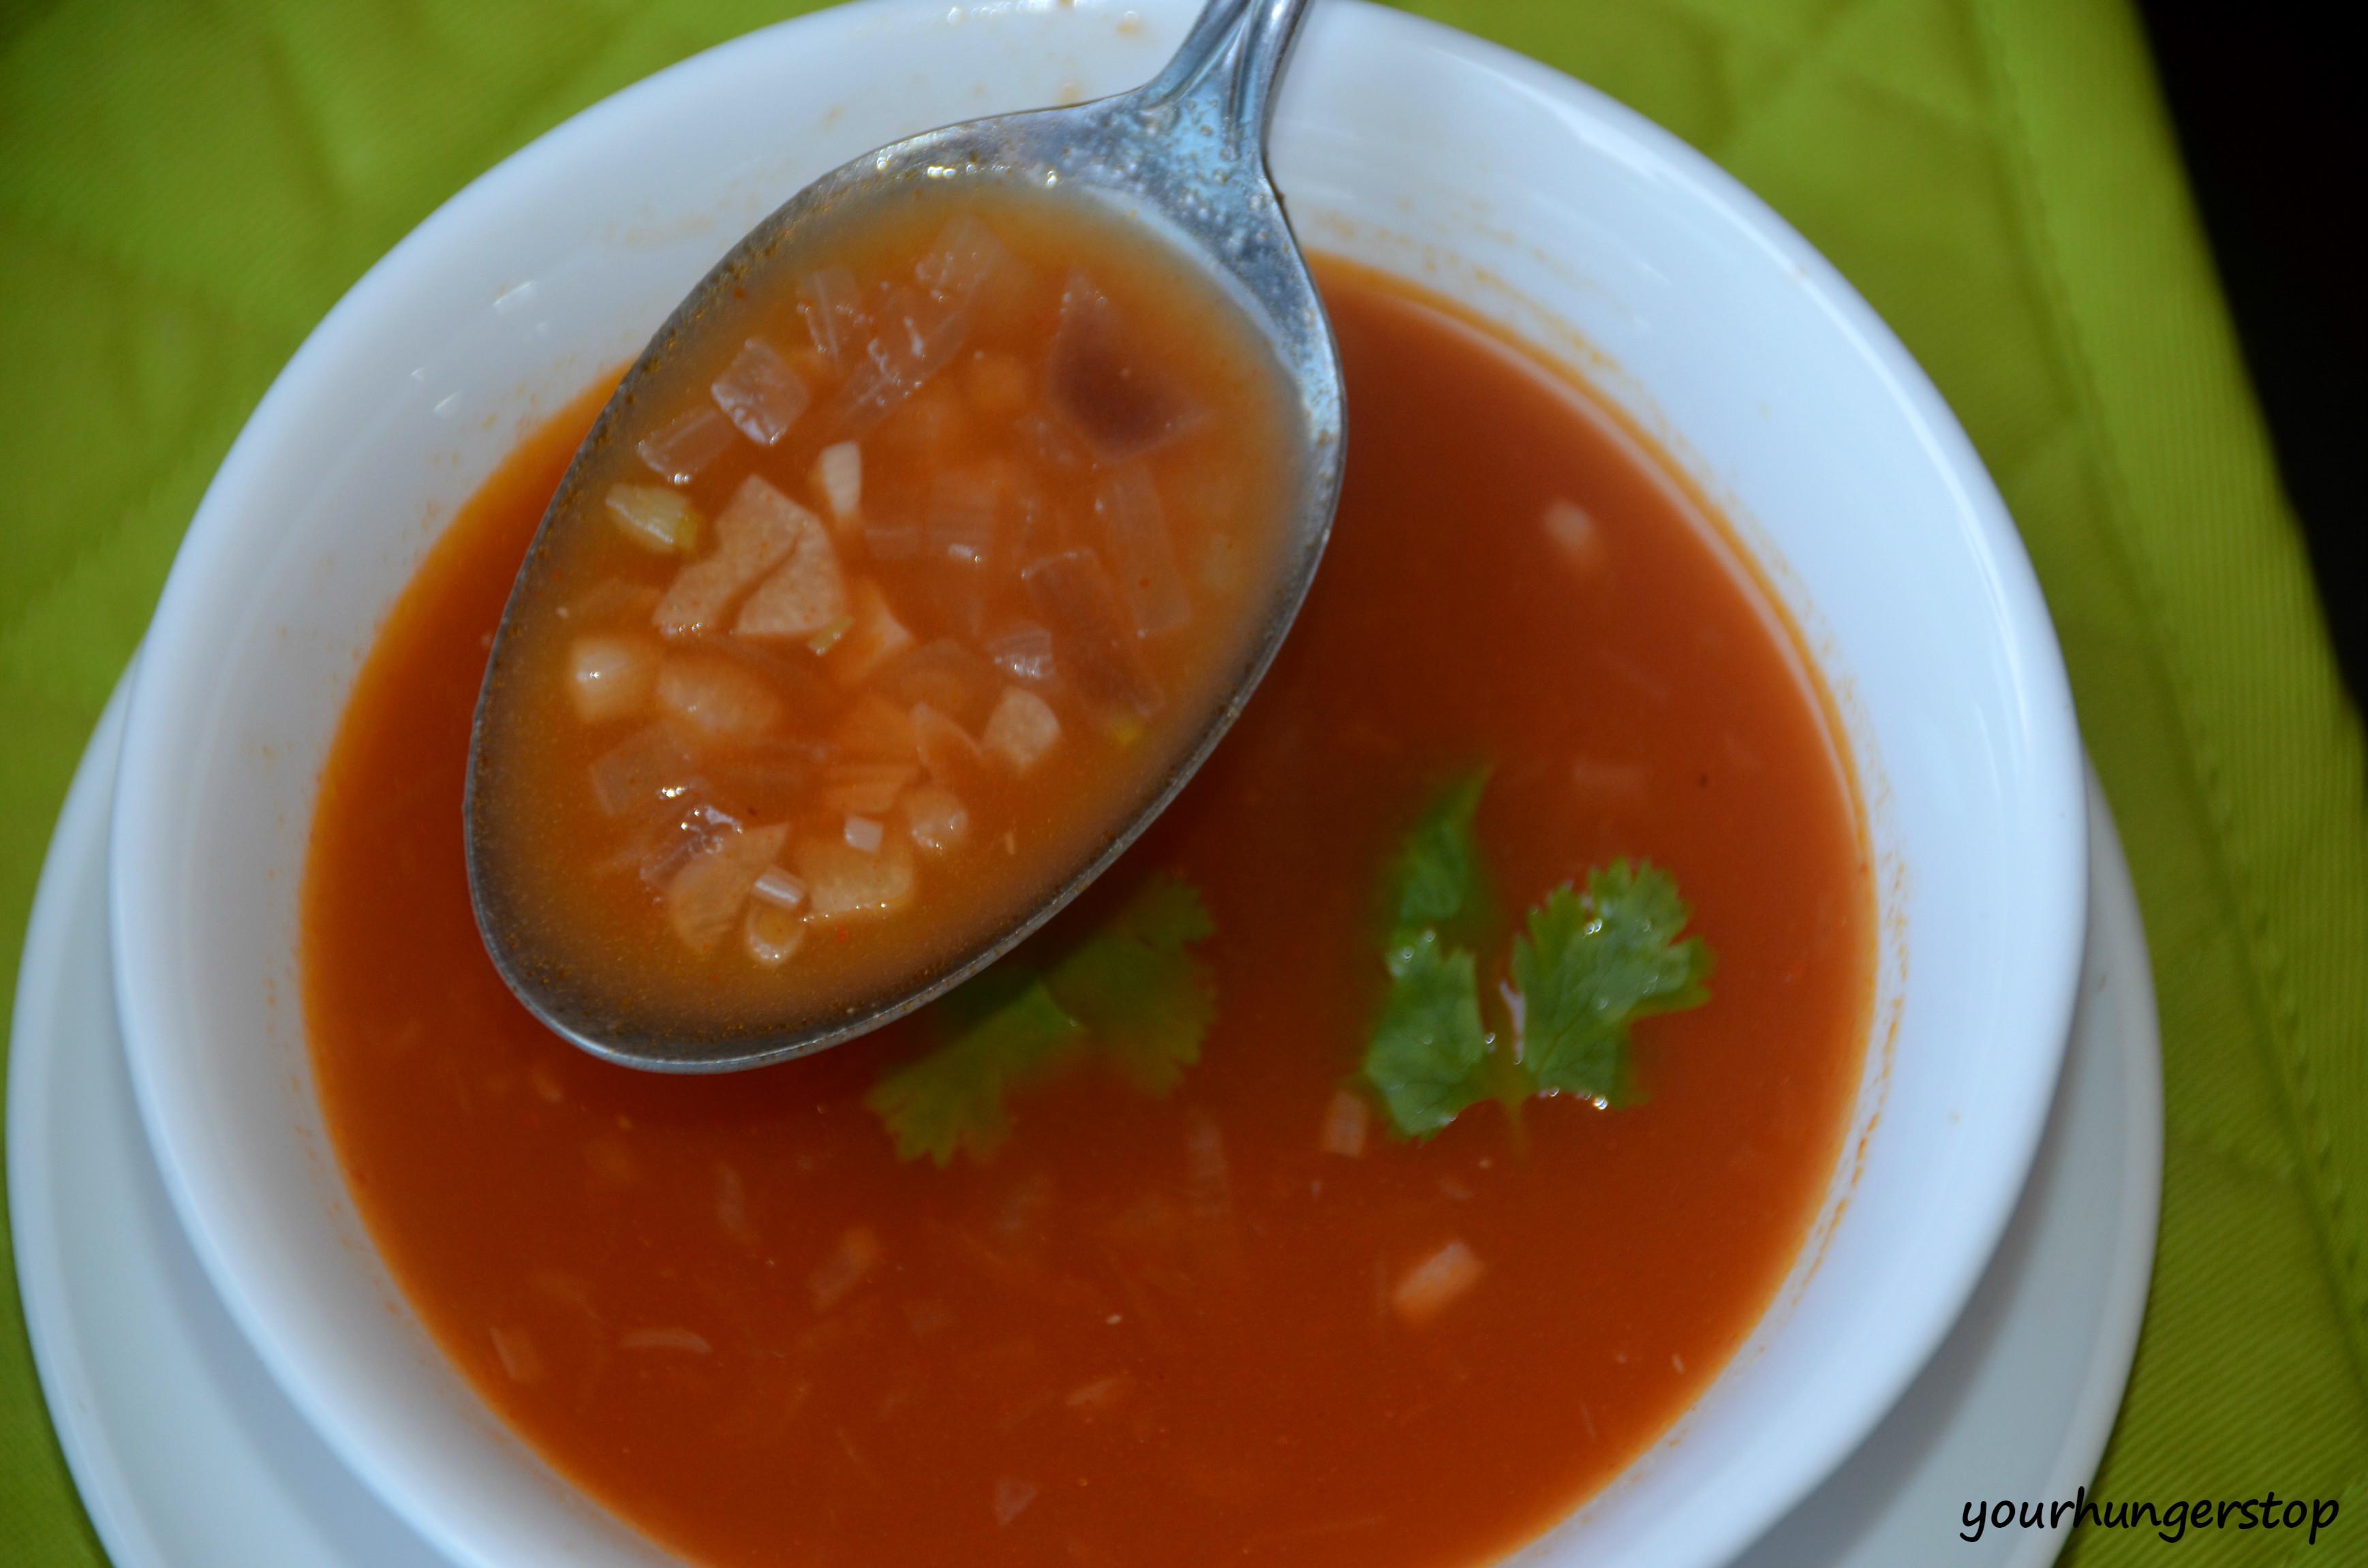 tomato soup recipe yourhungerstop. Black Bedroom Furniture Sets. Home Design Ideas